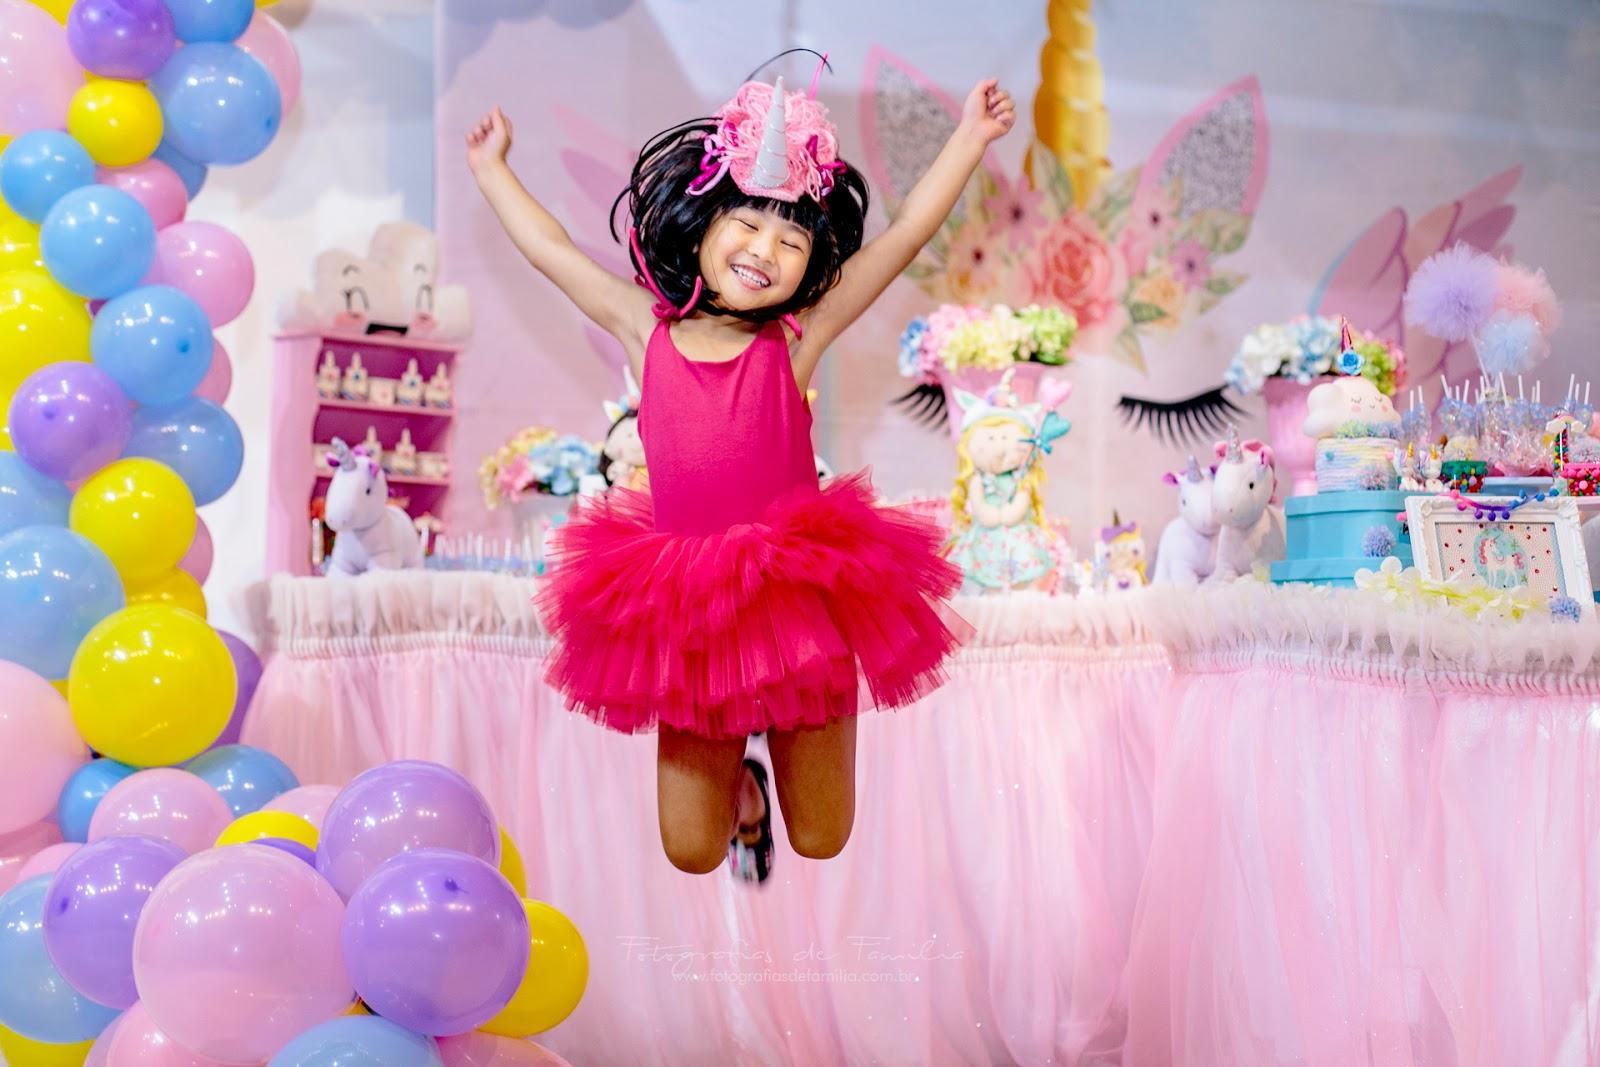 fotografias-festa-infantil